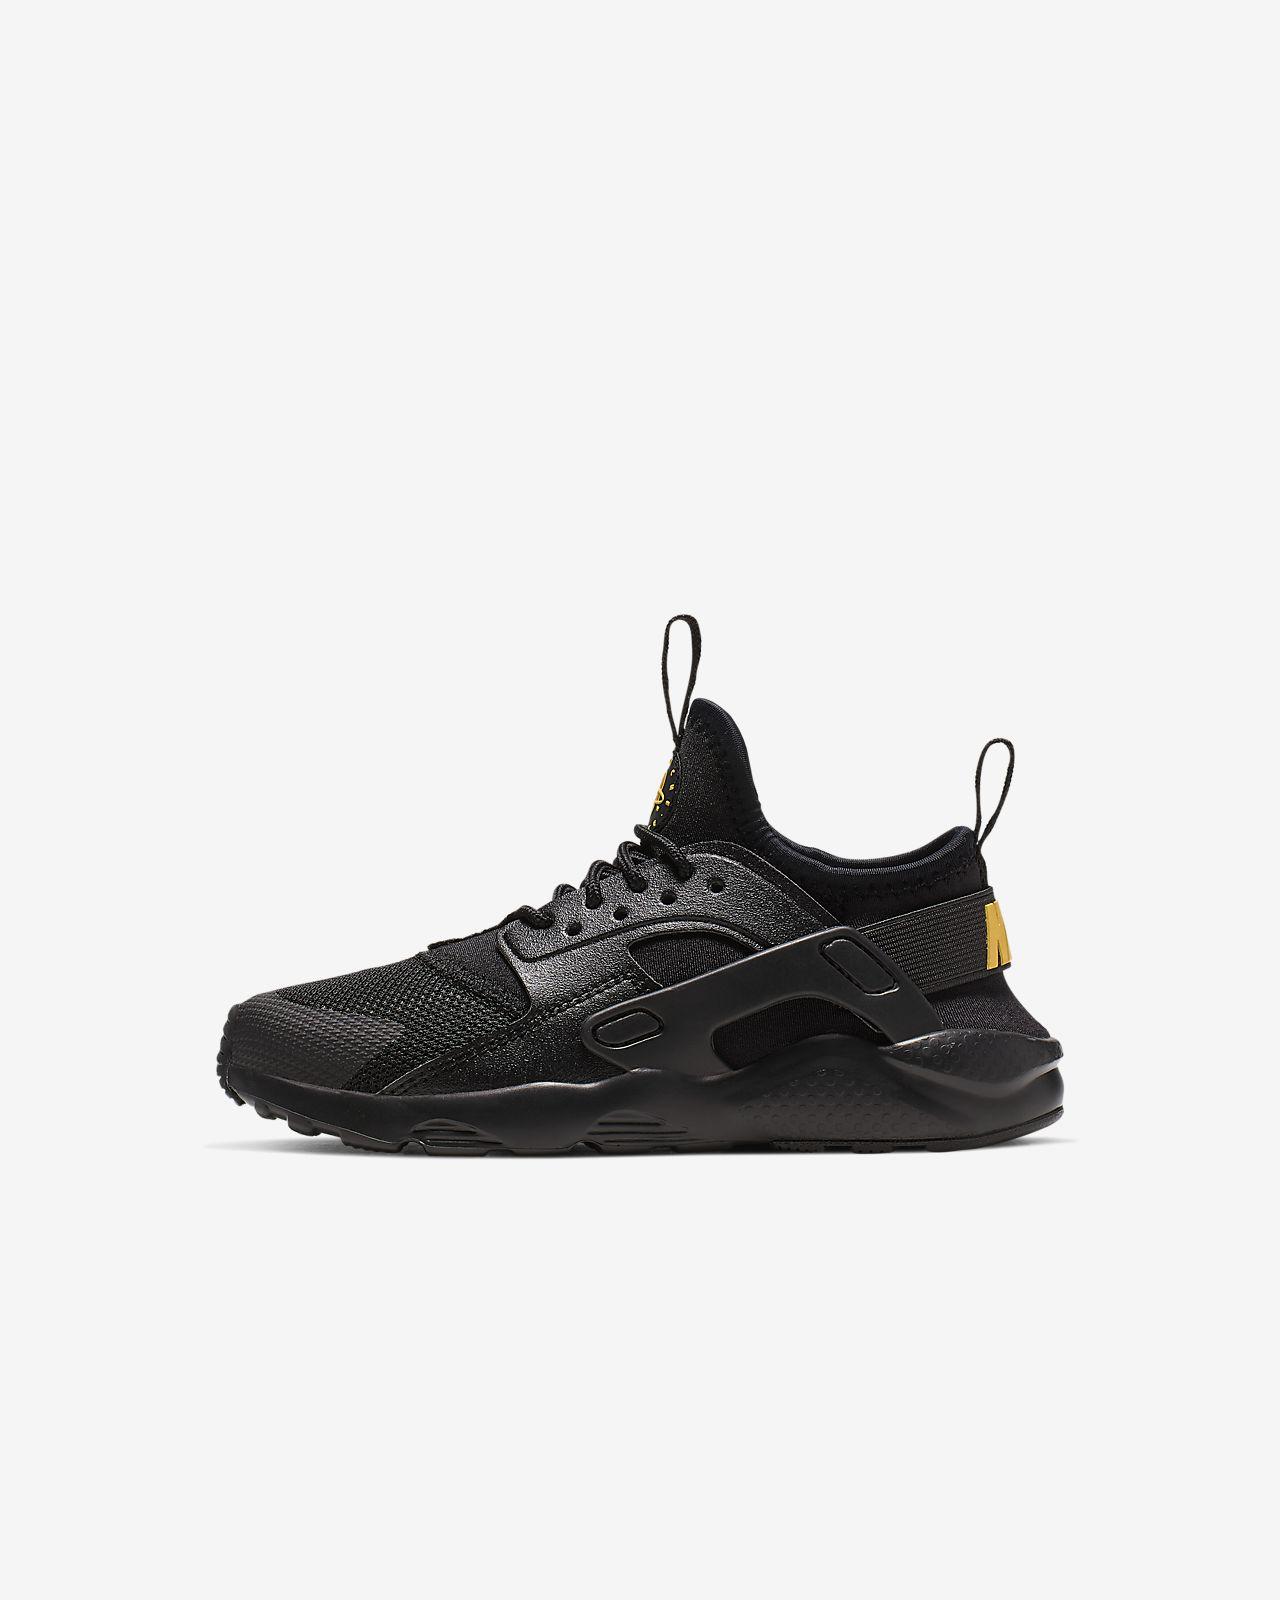 Chaussure Nike Huarache Run Ultra pour Jeune enfant